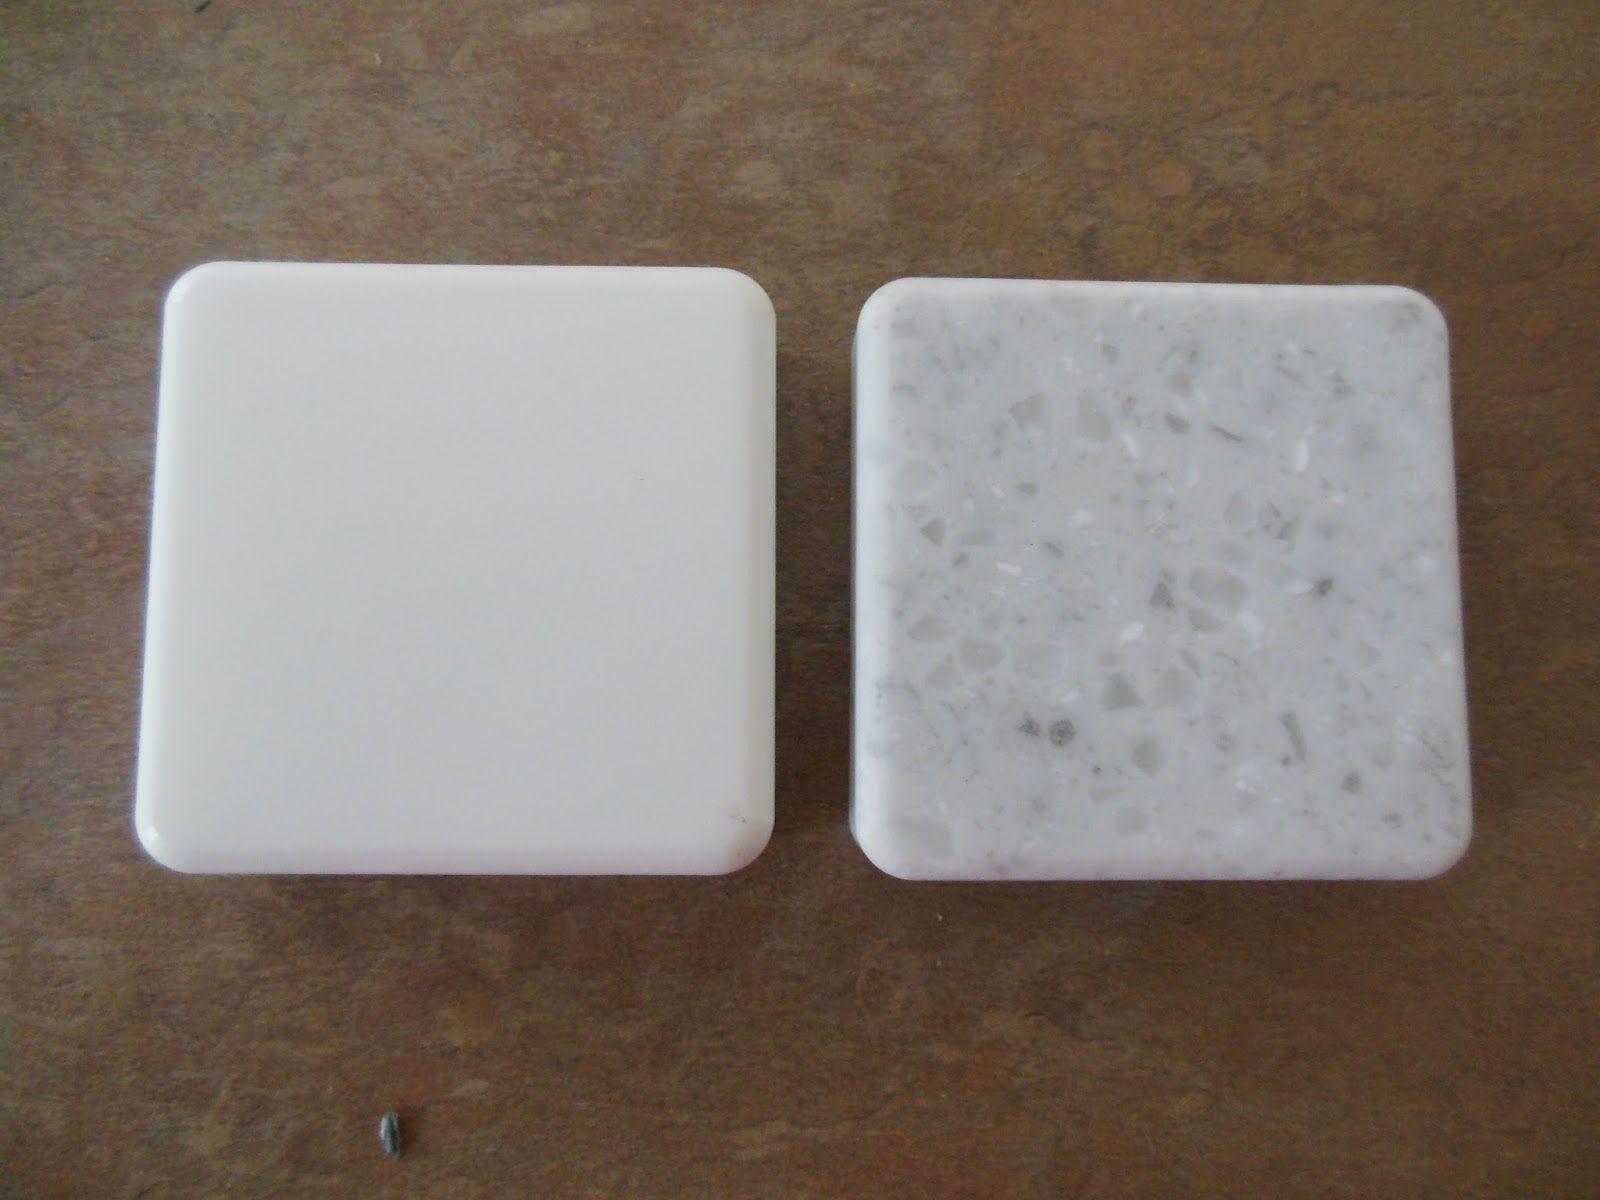 LG HI MACS Colors: Arctic White And Ripe Cotton. Granite Countertops Colors,